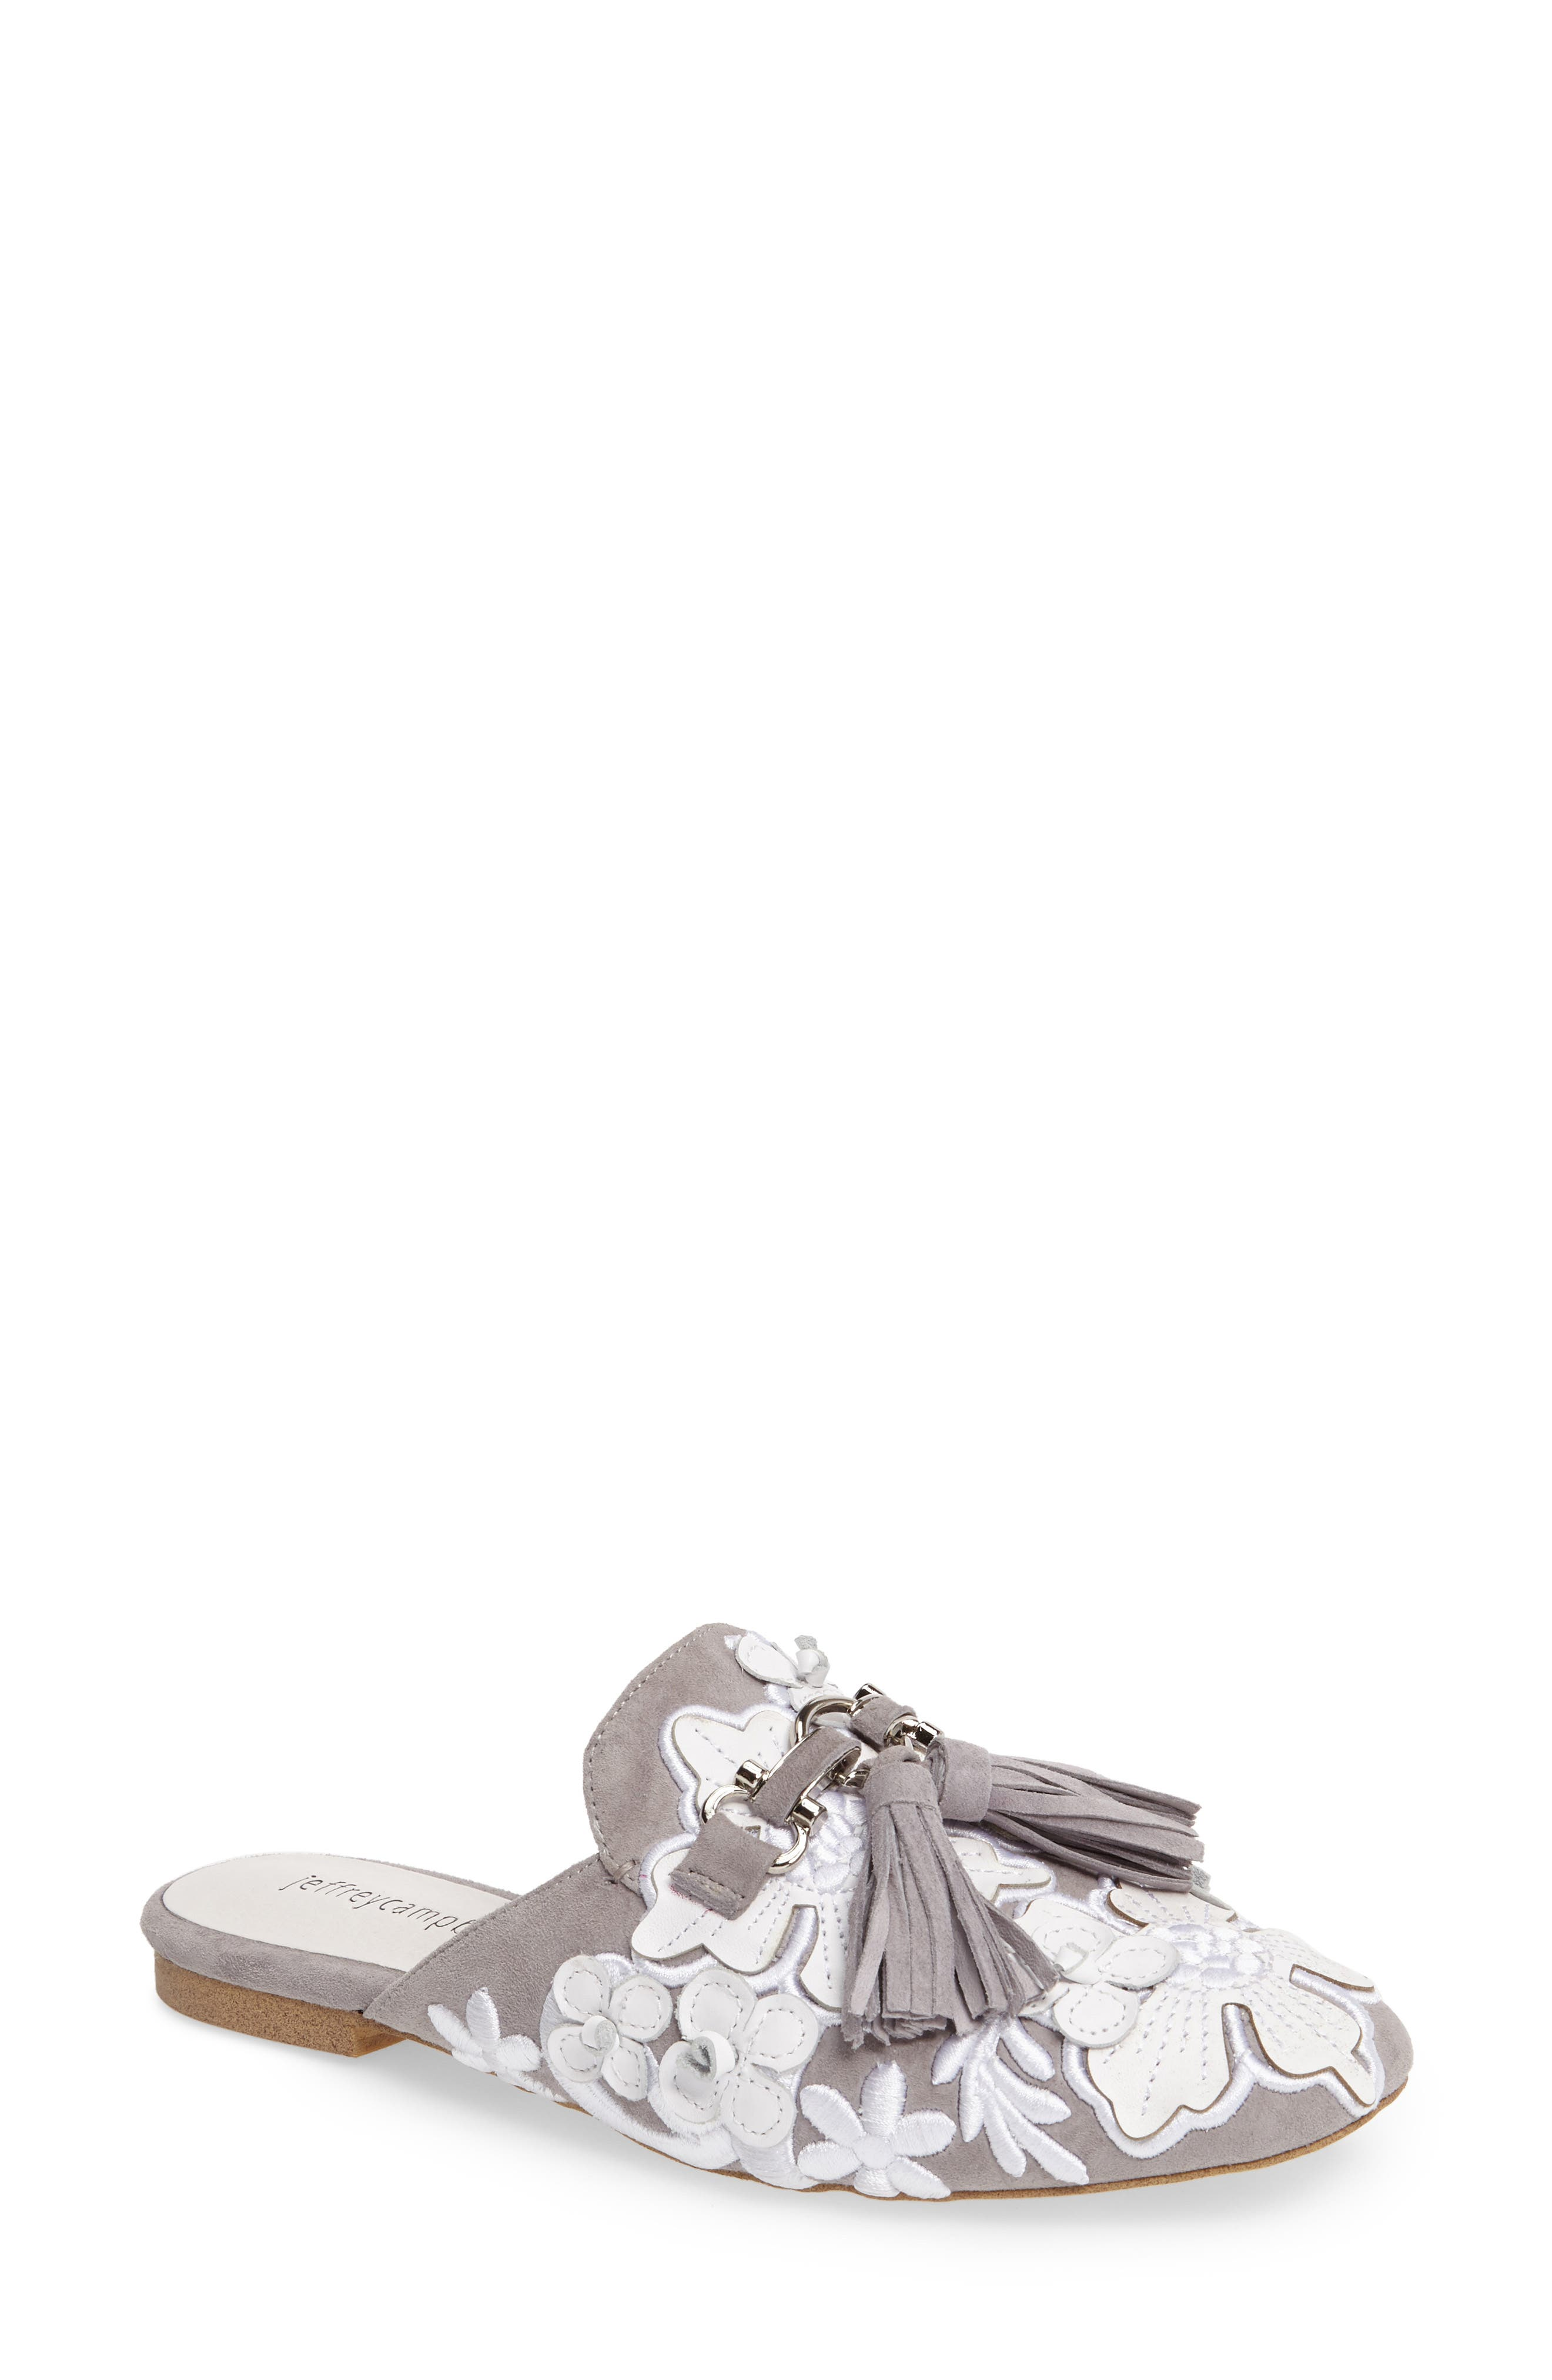 Alternate Image 1 Selected - Jeffrey Campbell Ravis Flowered Loafer Mule (Women)